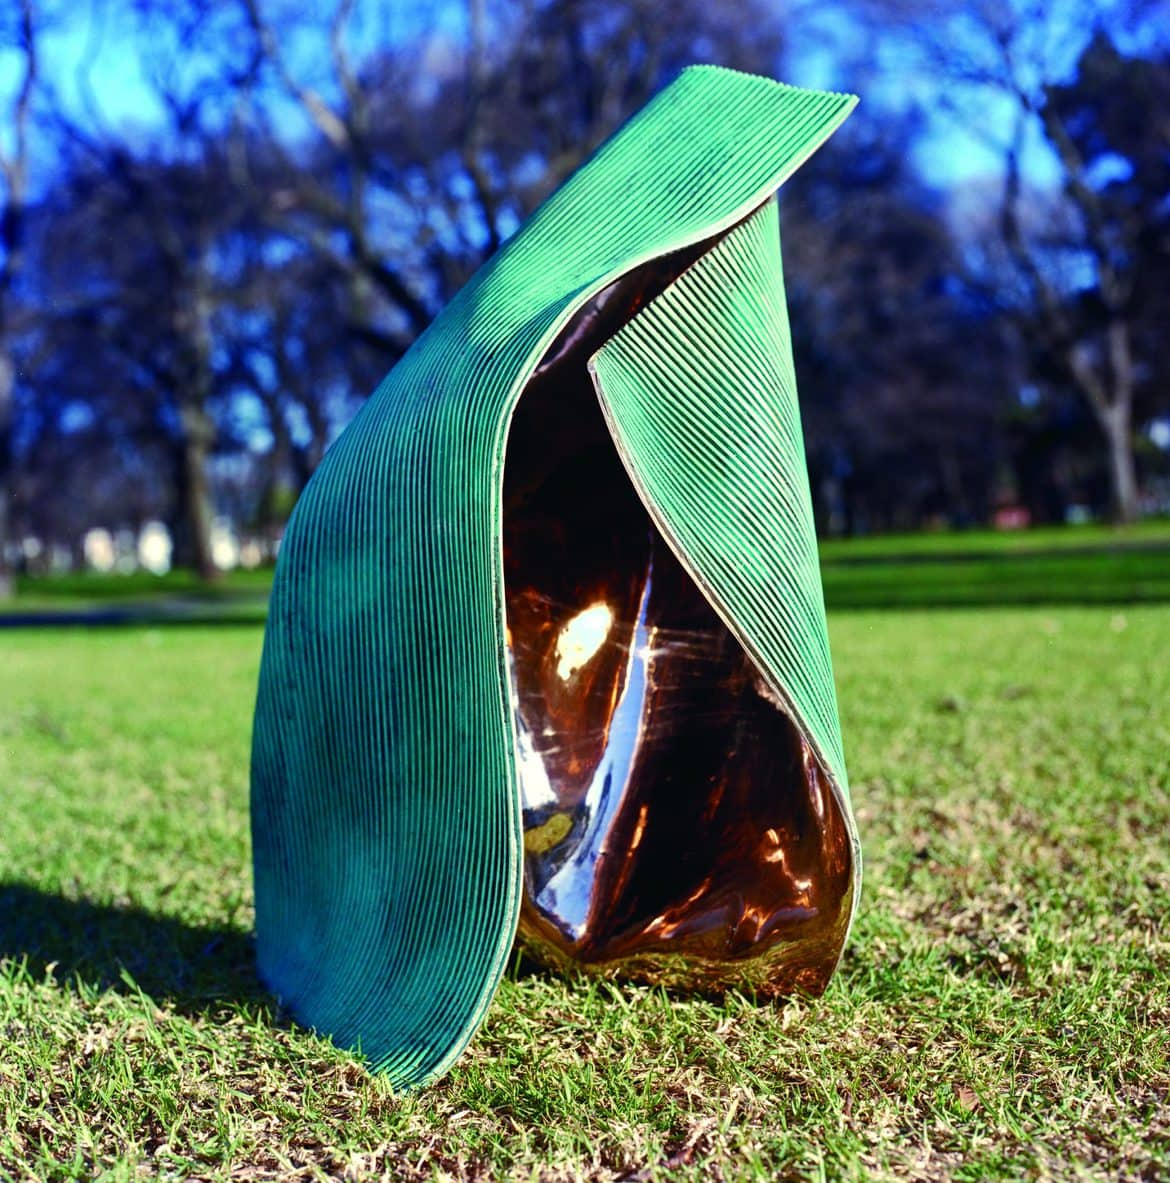 'Folded 3', 2003, bronze, 77 x 55 x 56 cm, edition 3 of 12 + 1AP